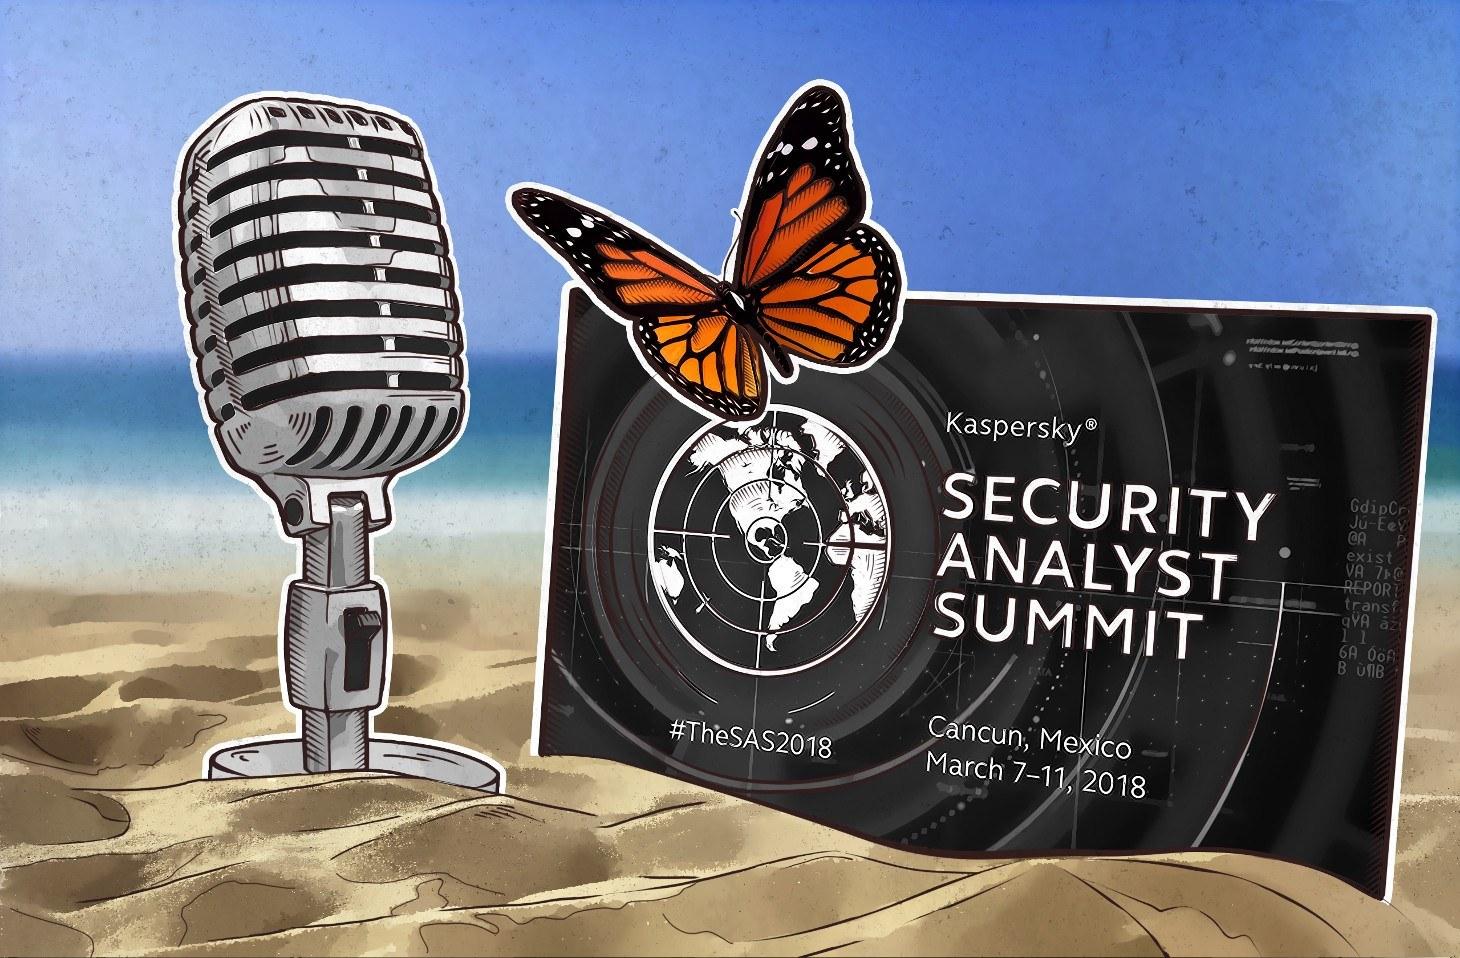 Security Analyst Summit 2018: Day 1 recap